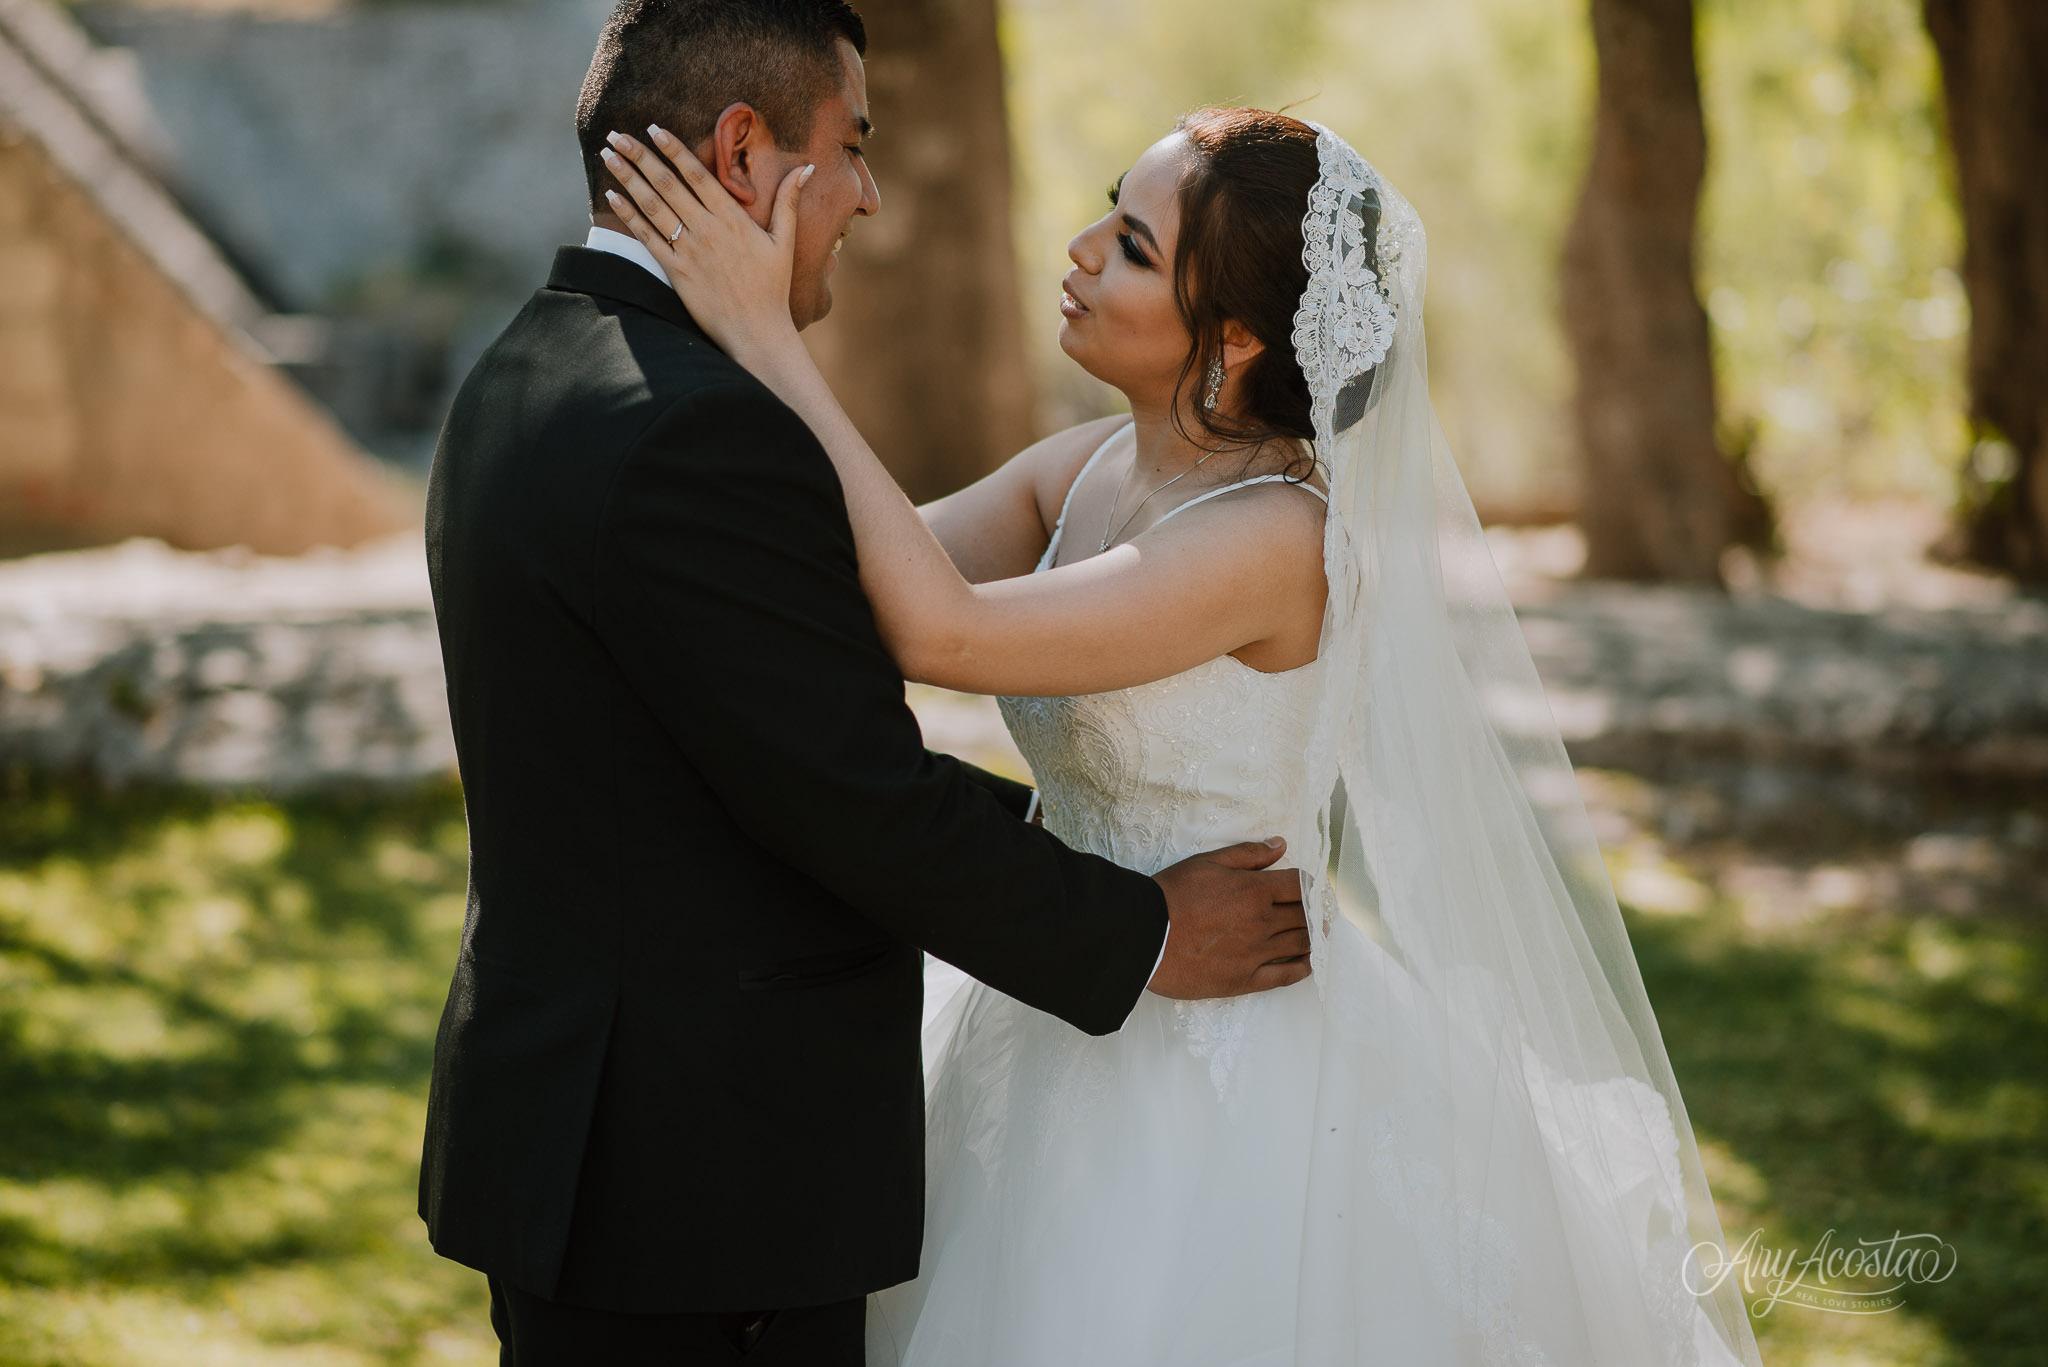 yazmin_ernesto_wedding-184.JPG